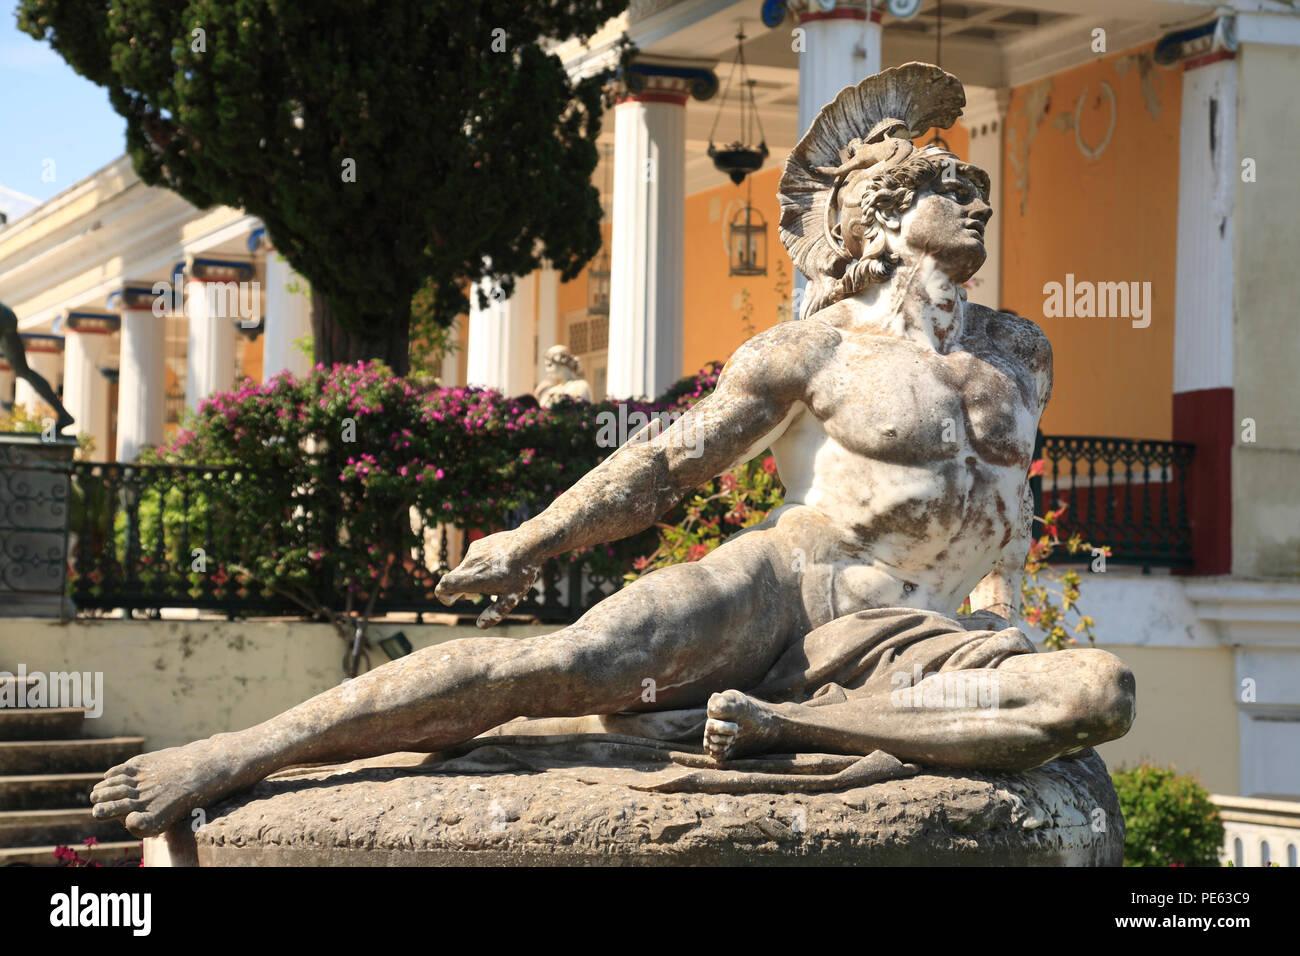 Achill monument, Achilleion, Benitses, Corfu, Greece, Europe - Stock Image